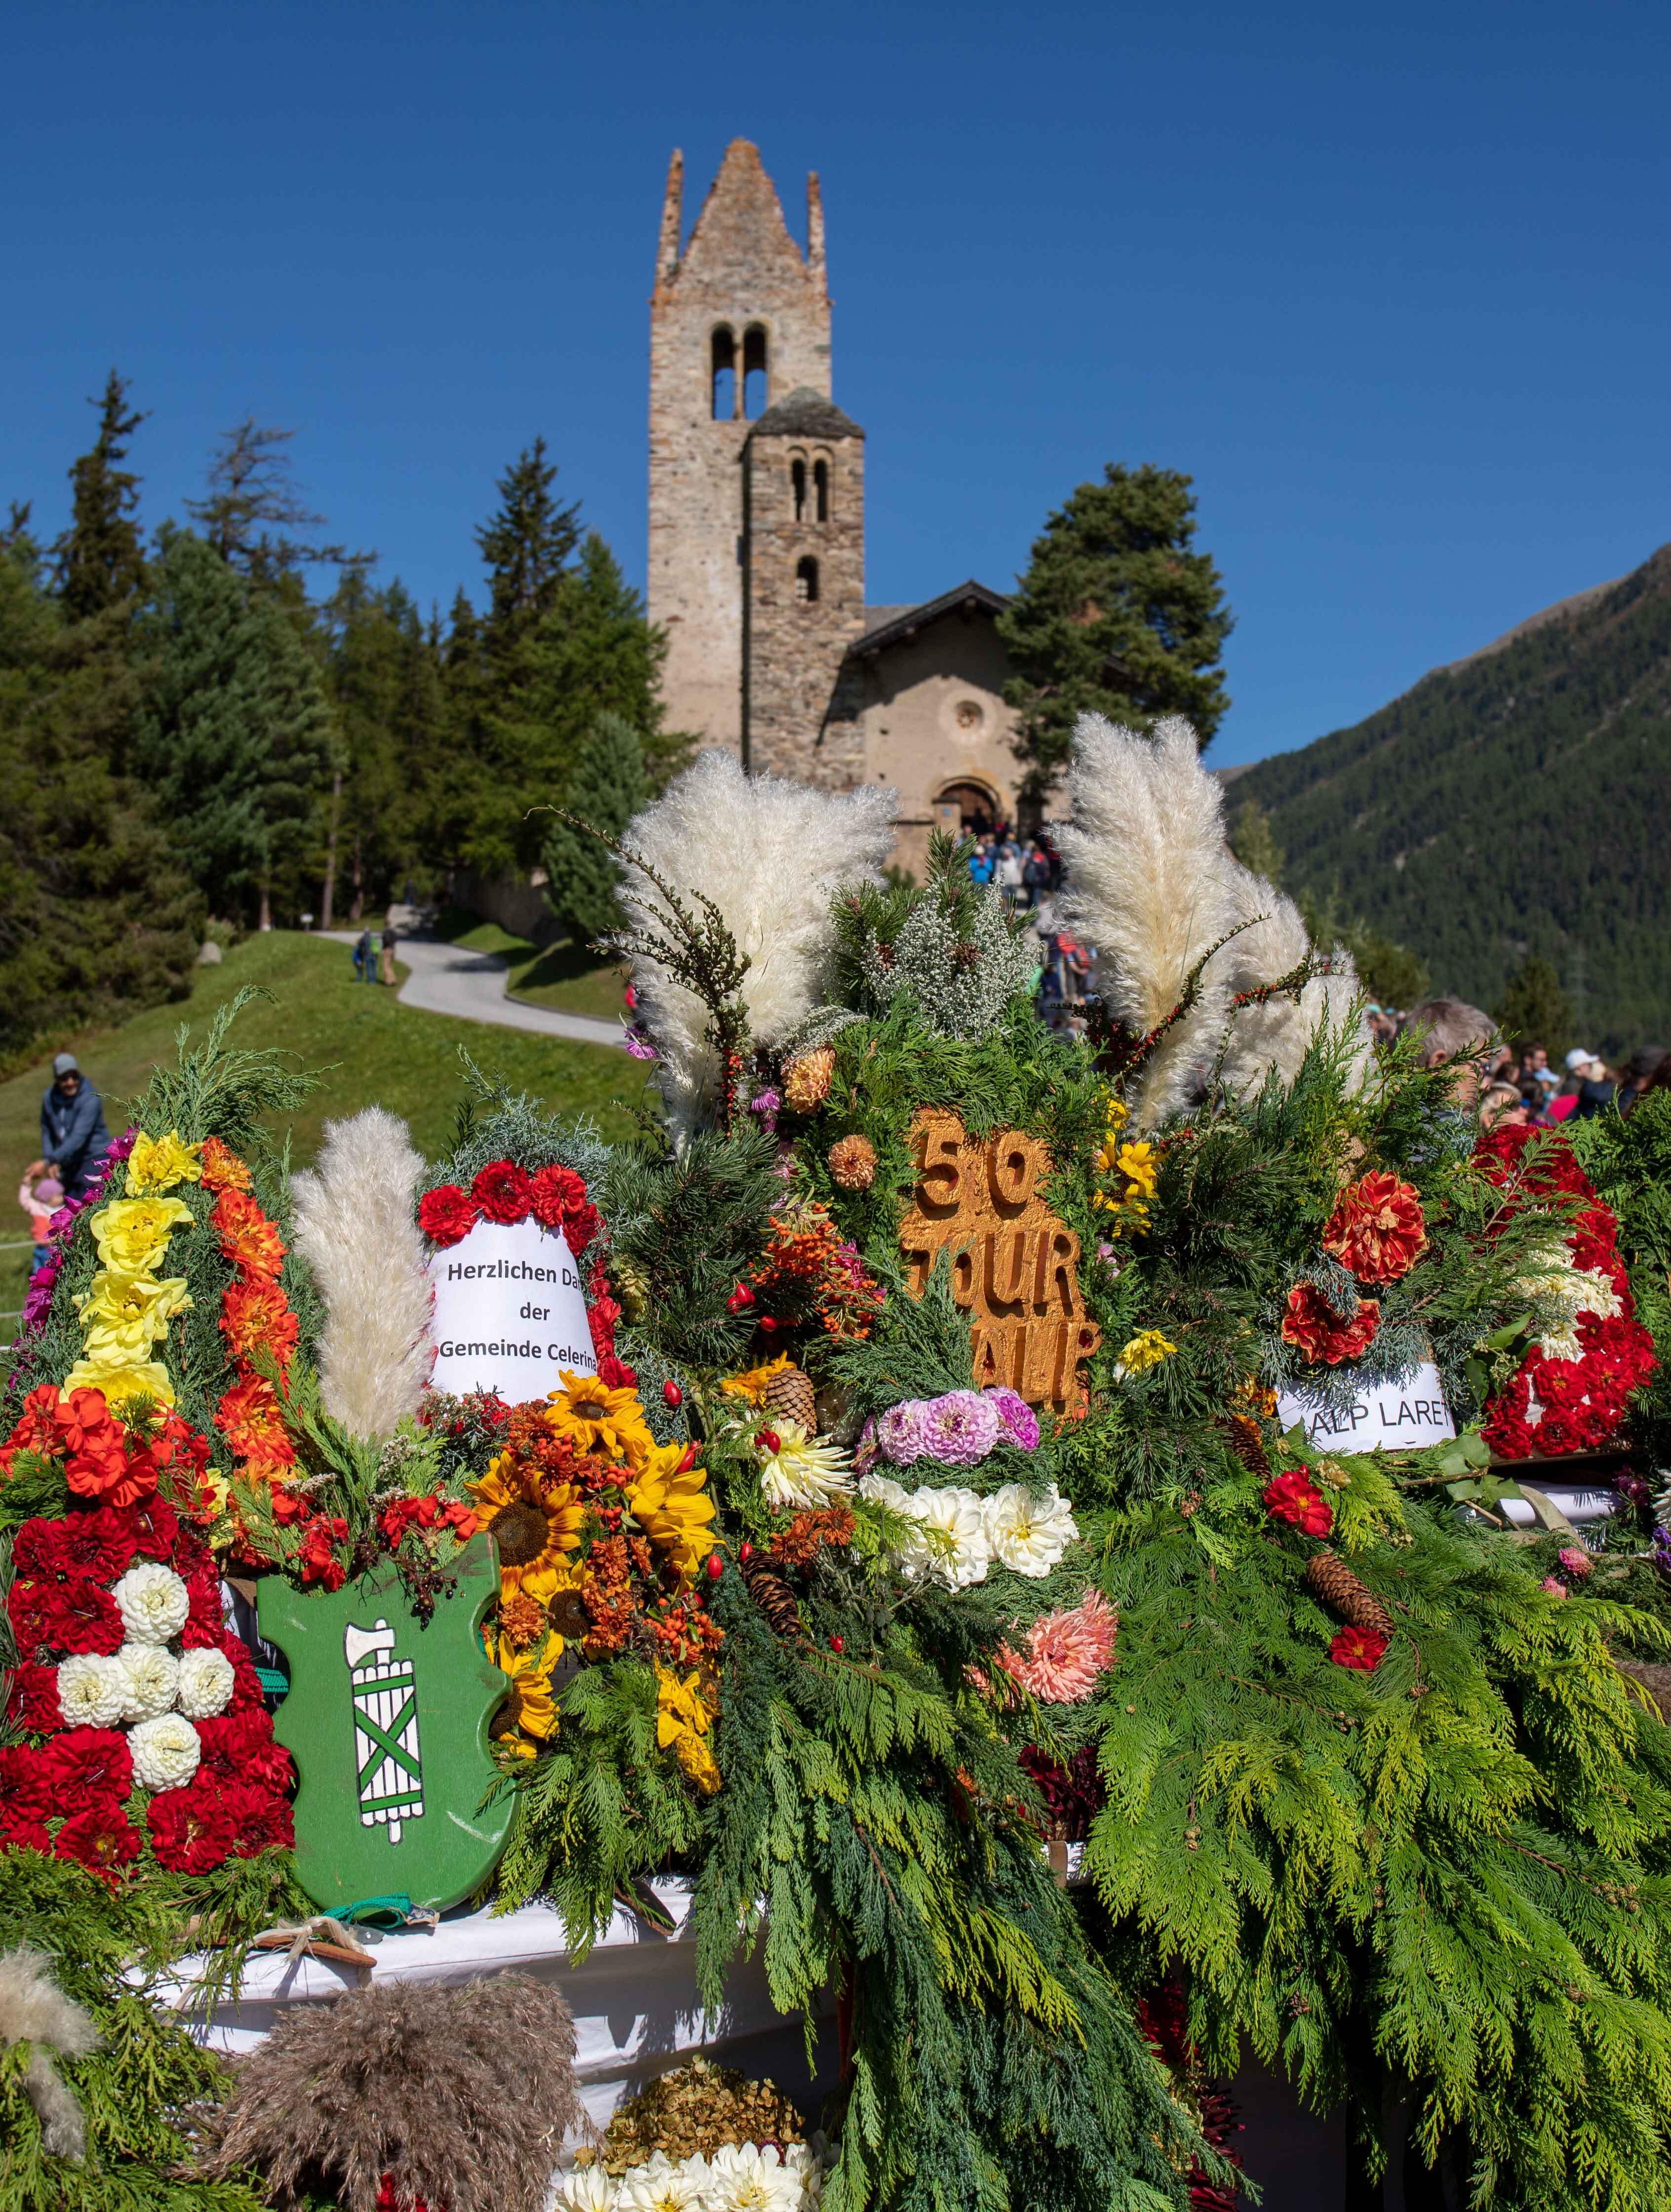 50 years as an alpine dairy farmer: a special celebration